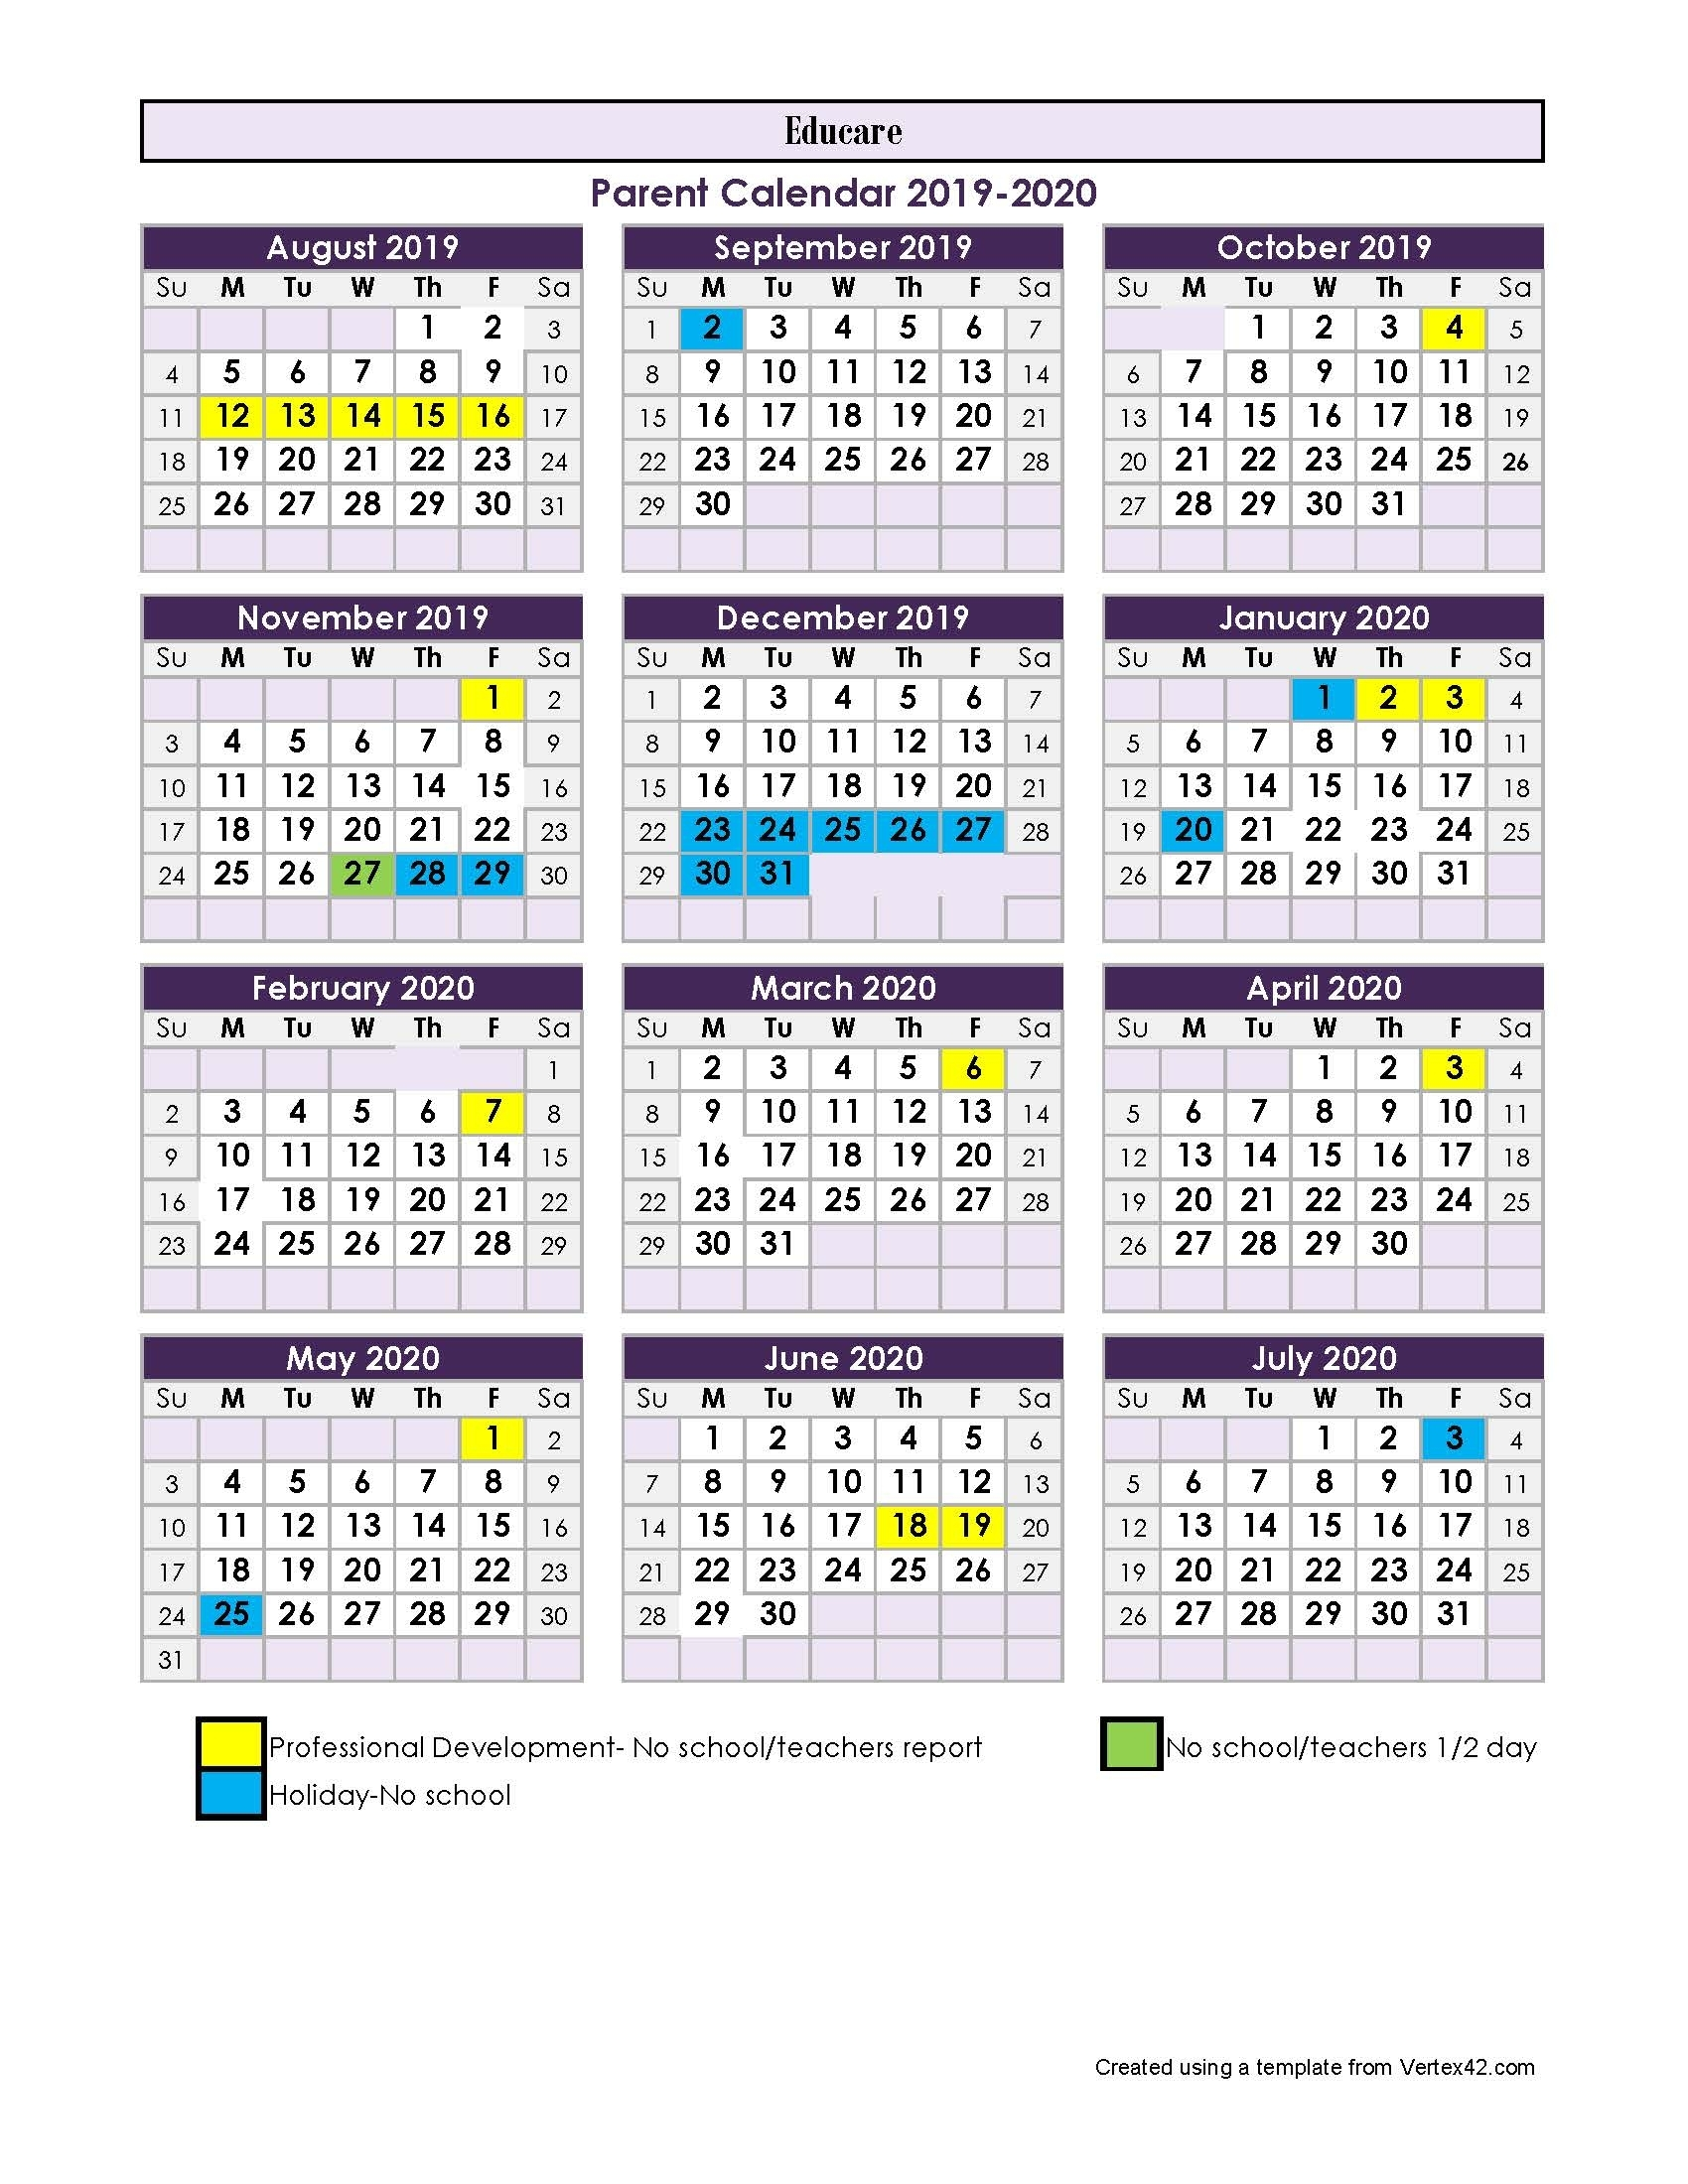 Parent Calendar - 2017-2018 with regard to 2019-2020 Calendar Vertex